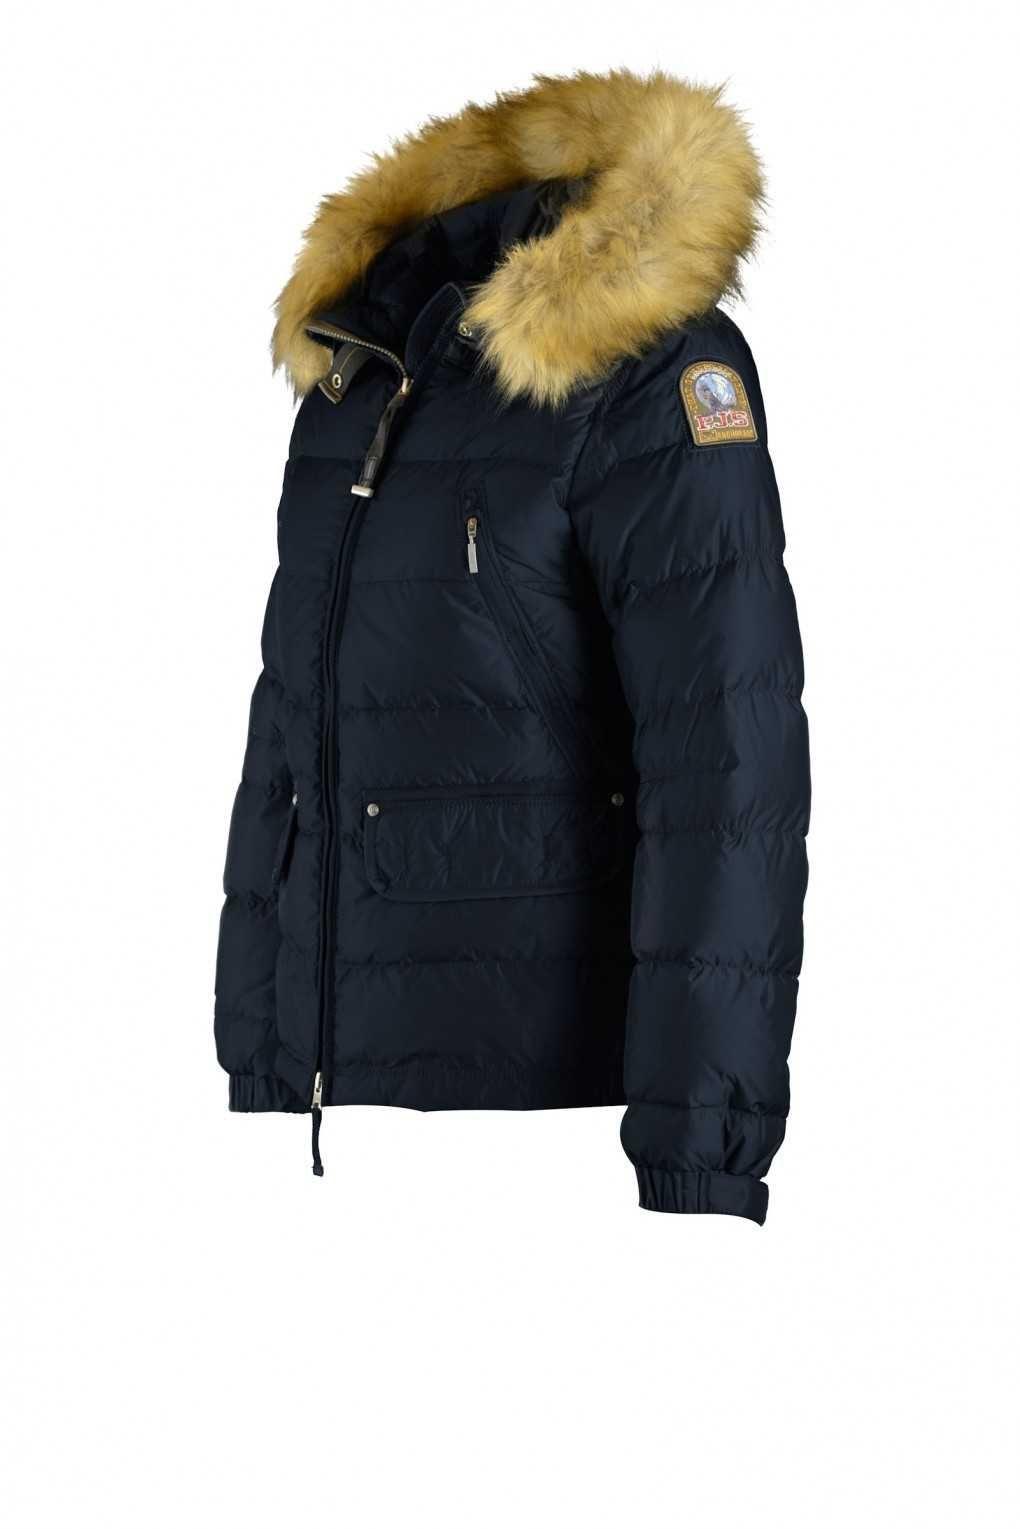 Warm winter jackets toronto